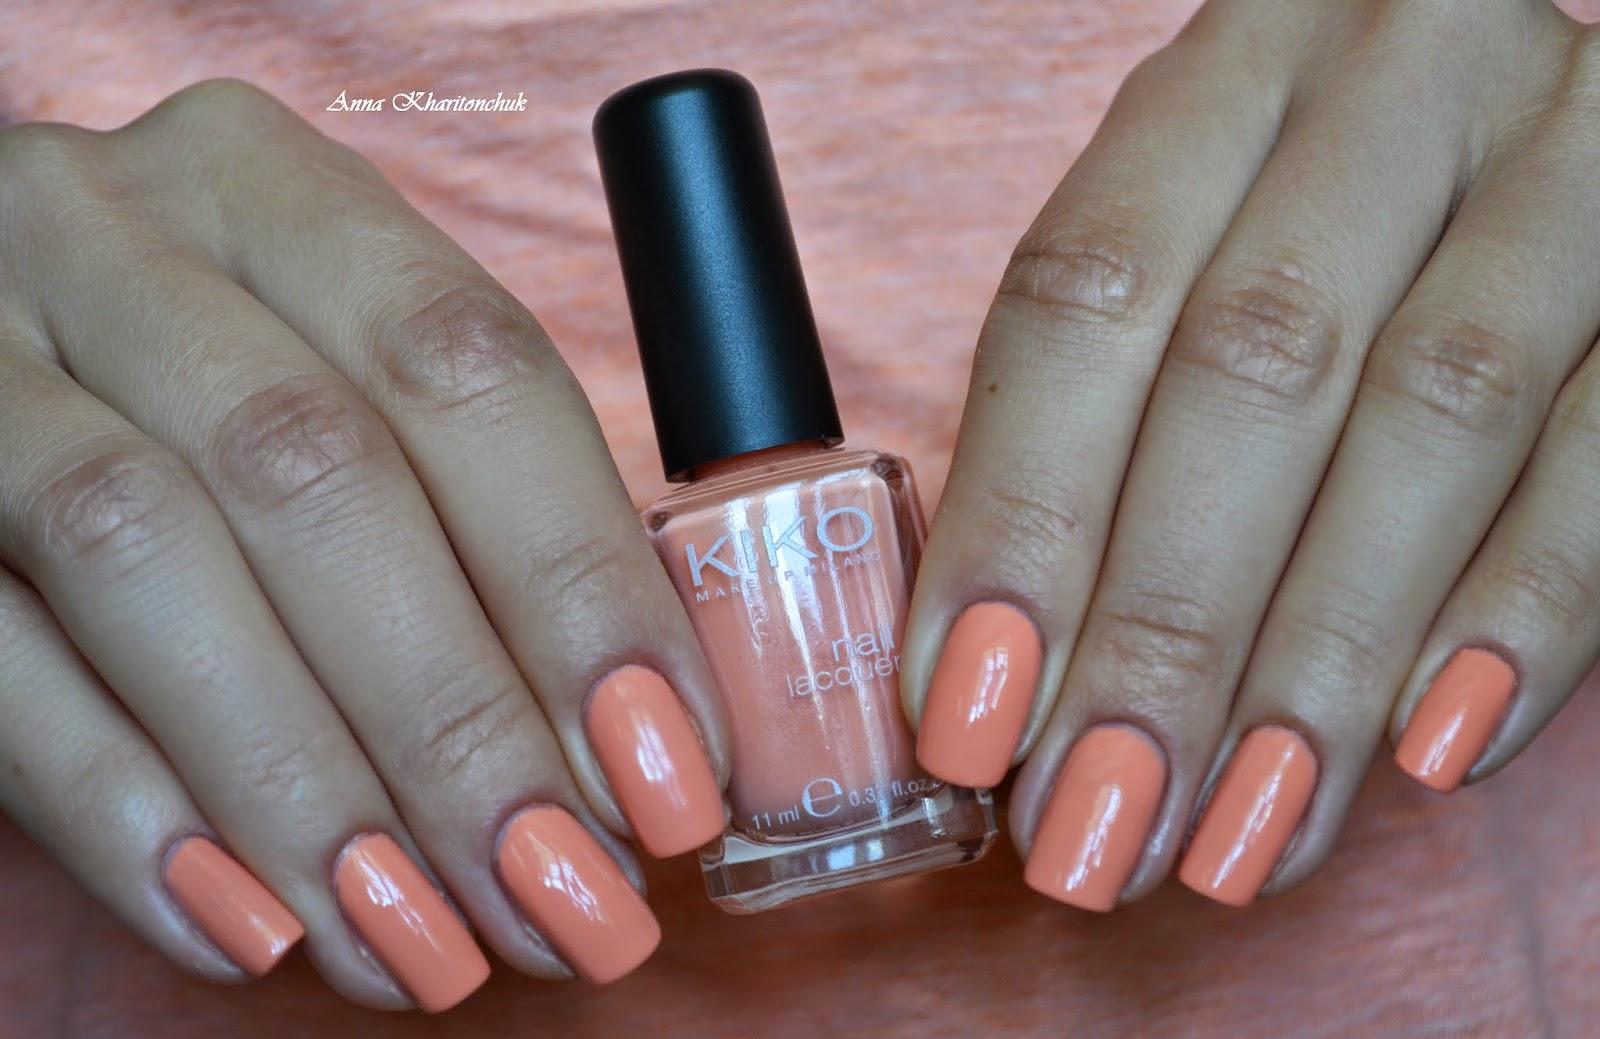 Kiko 359 Light Peach